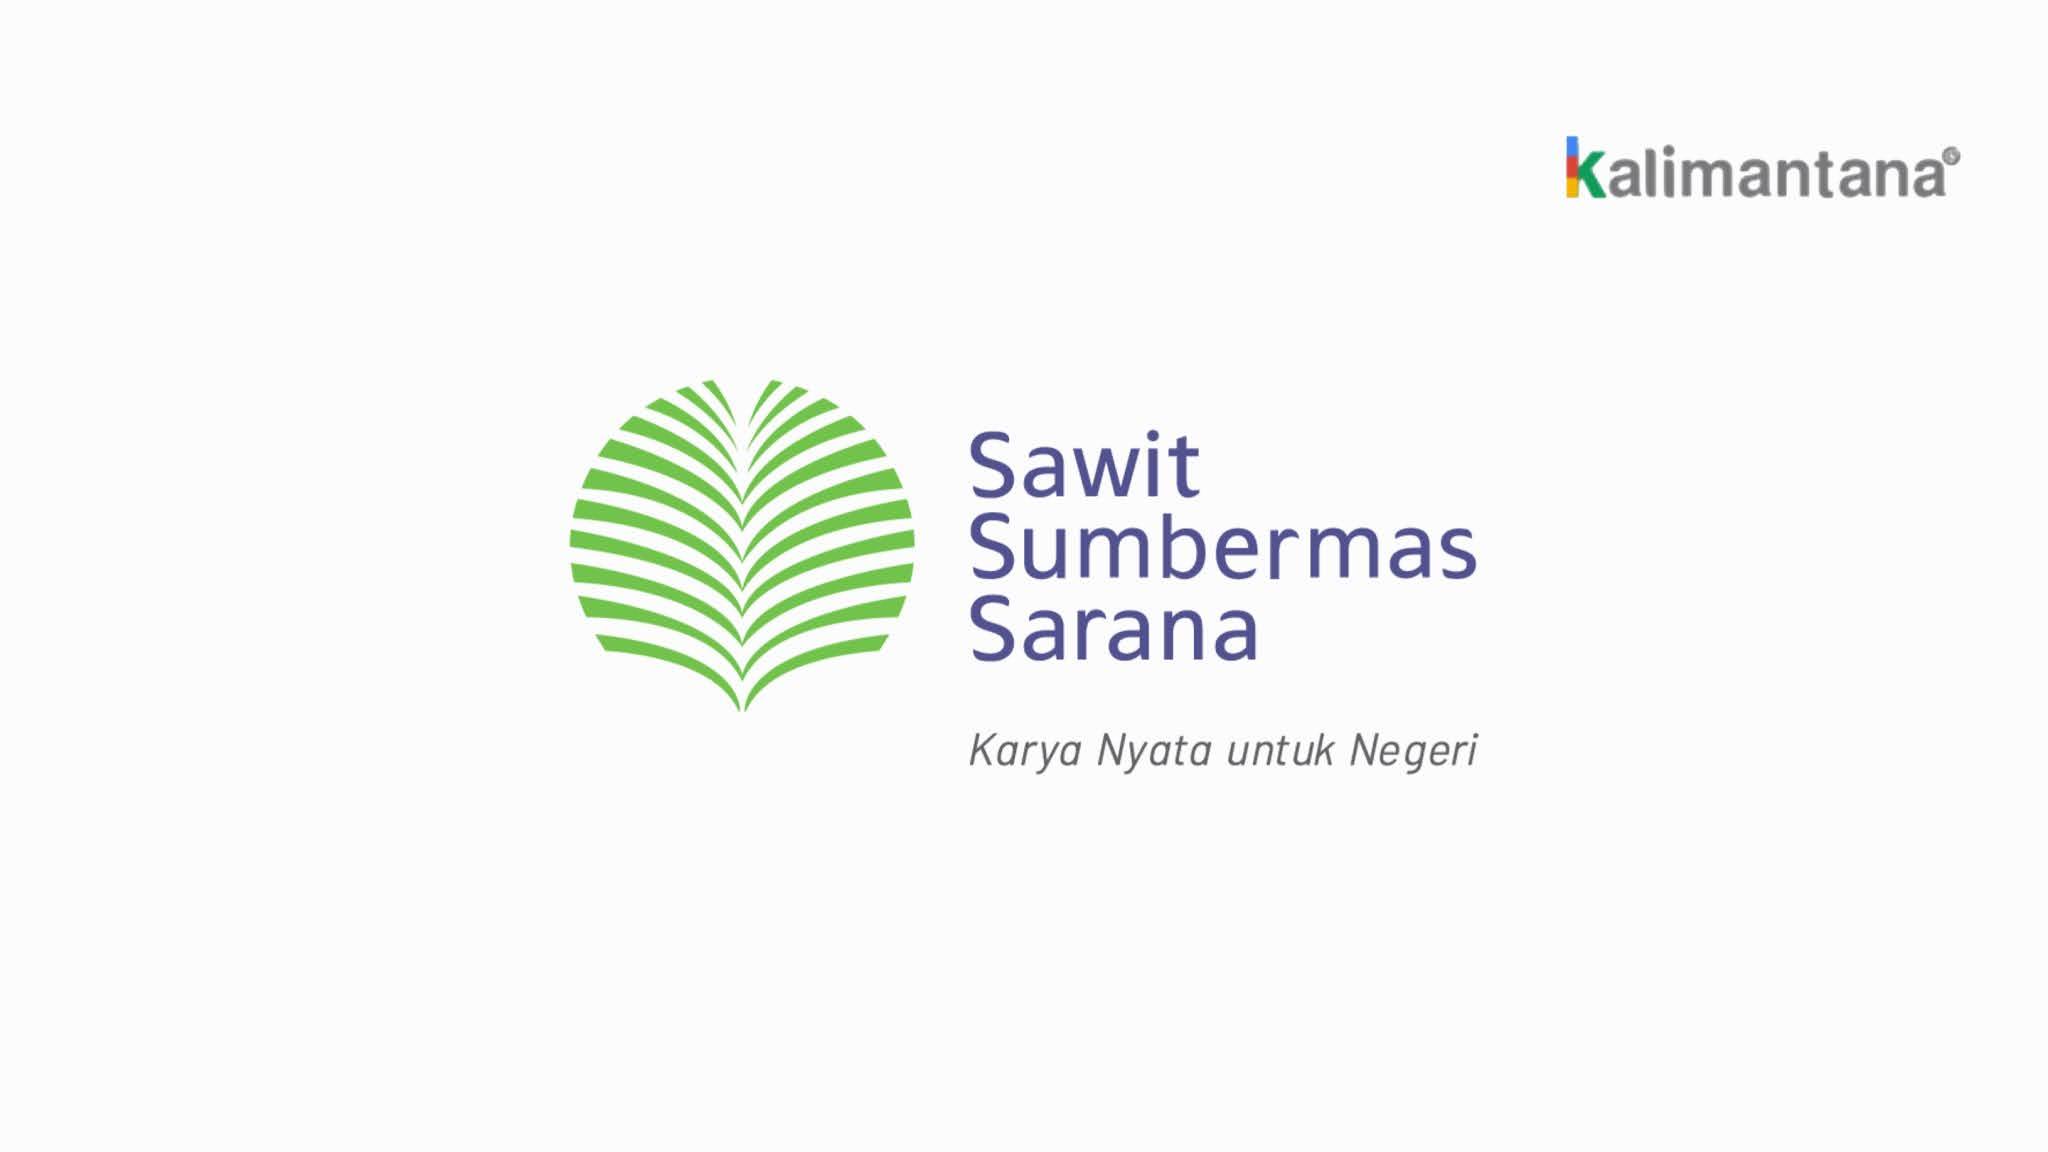 PT. Sawit Sumbermas Sarana